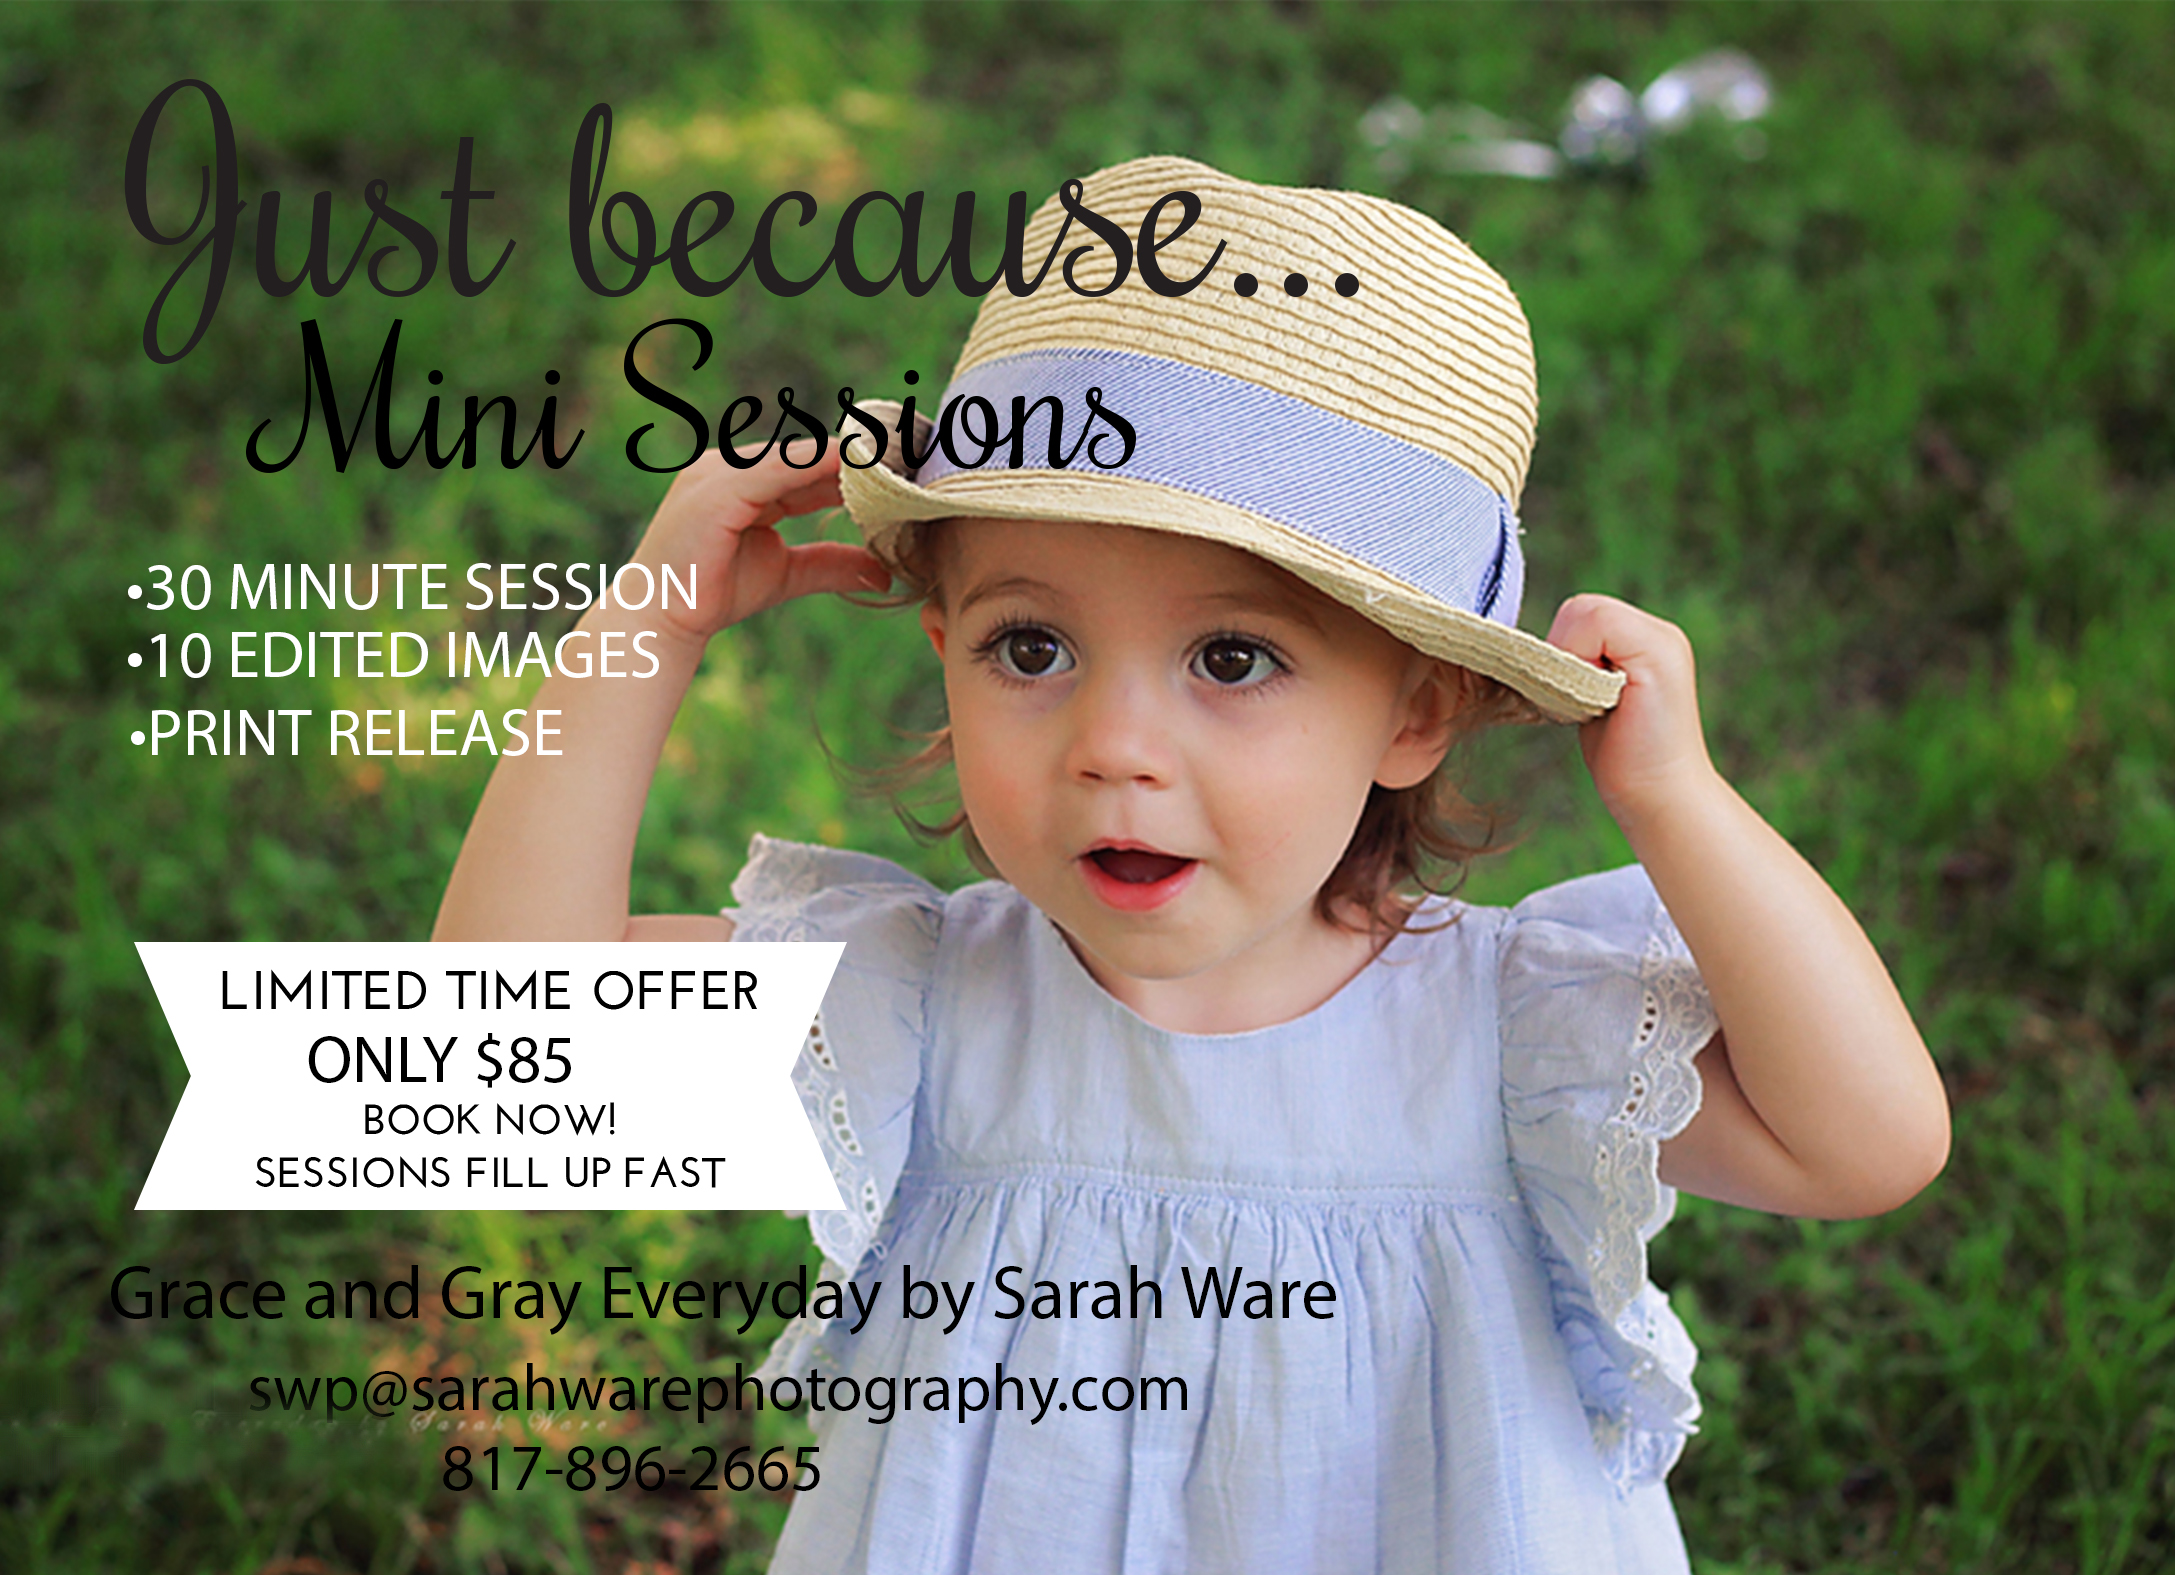 Mini Sessions are perfect for milestone photos!